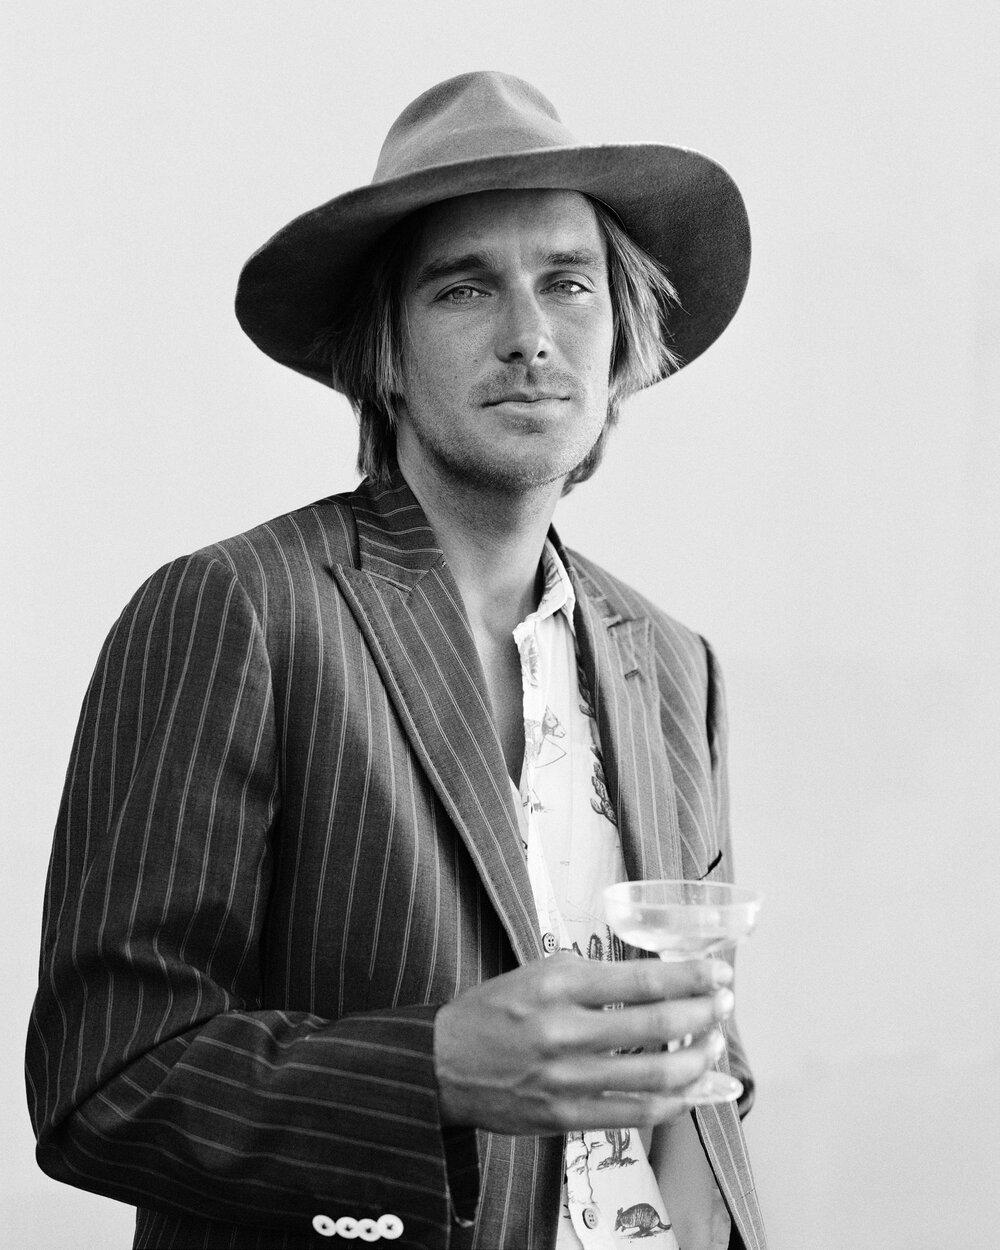 Levi Prairie - Artist, Musician, Surfer. Costa Mesa.